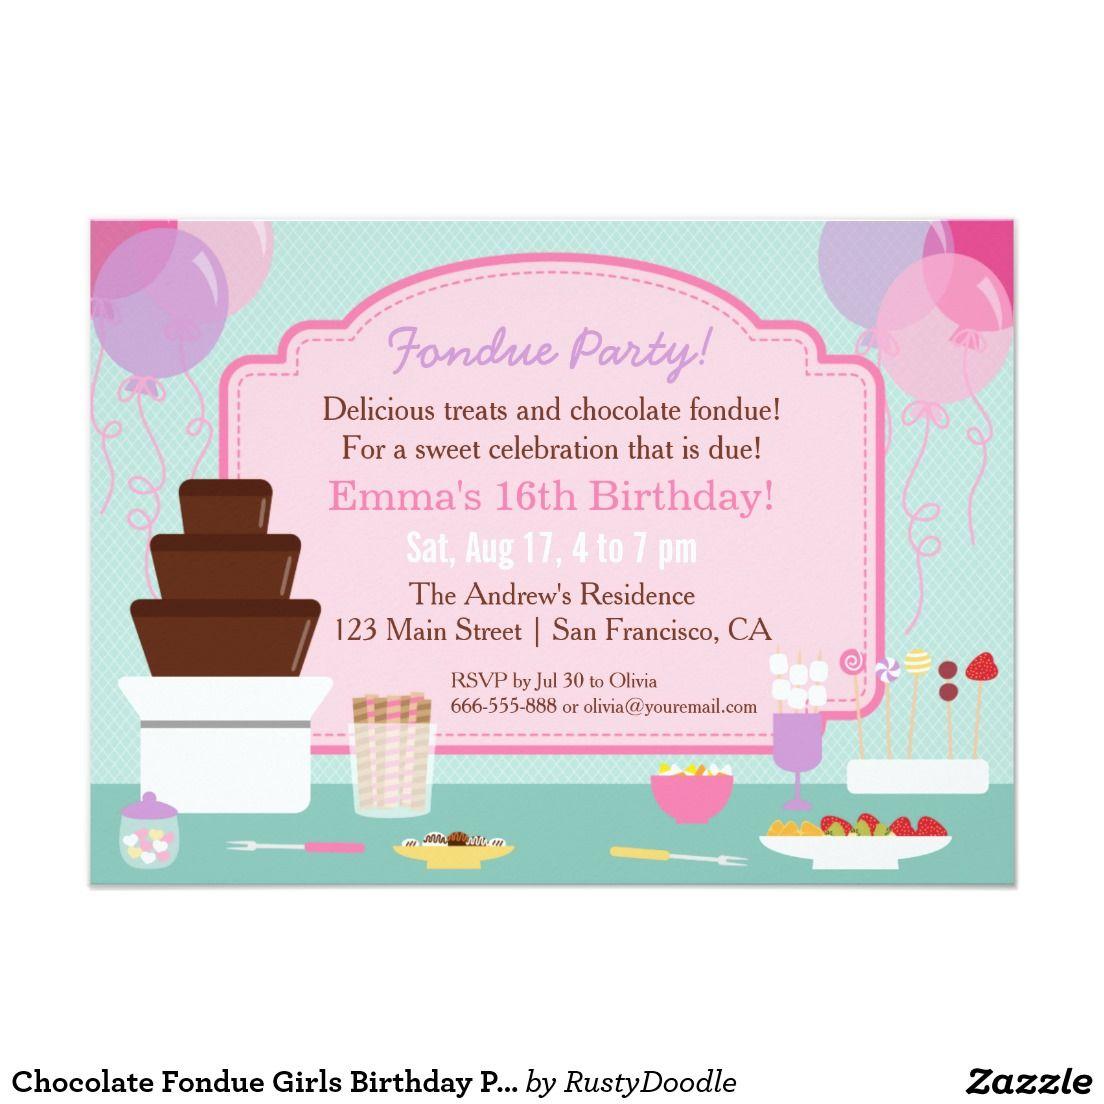 Chocolate Fondue Girls Birthday Party Invitations   Chocolate ...